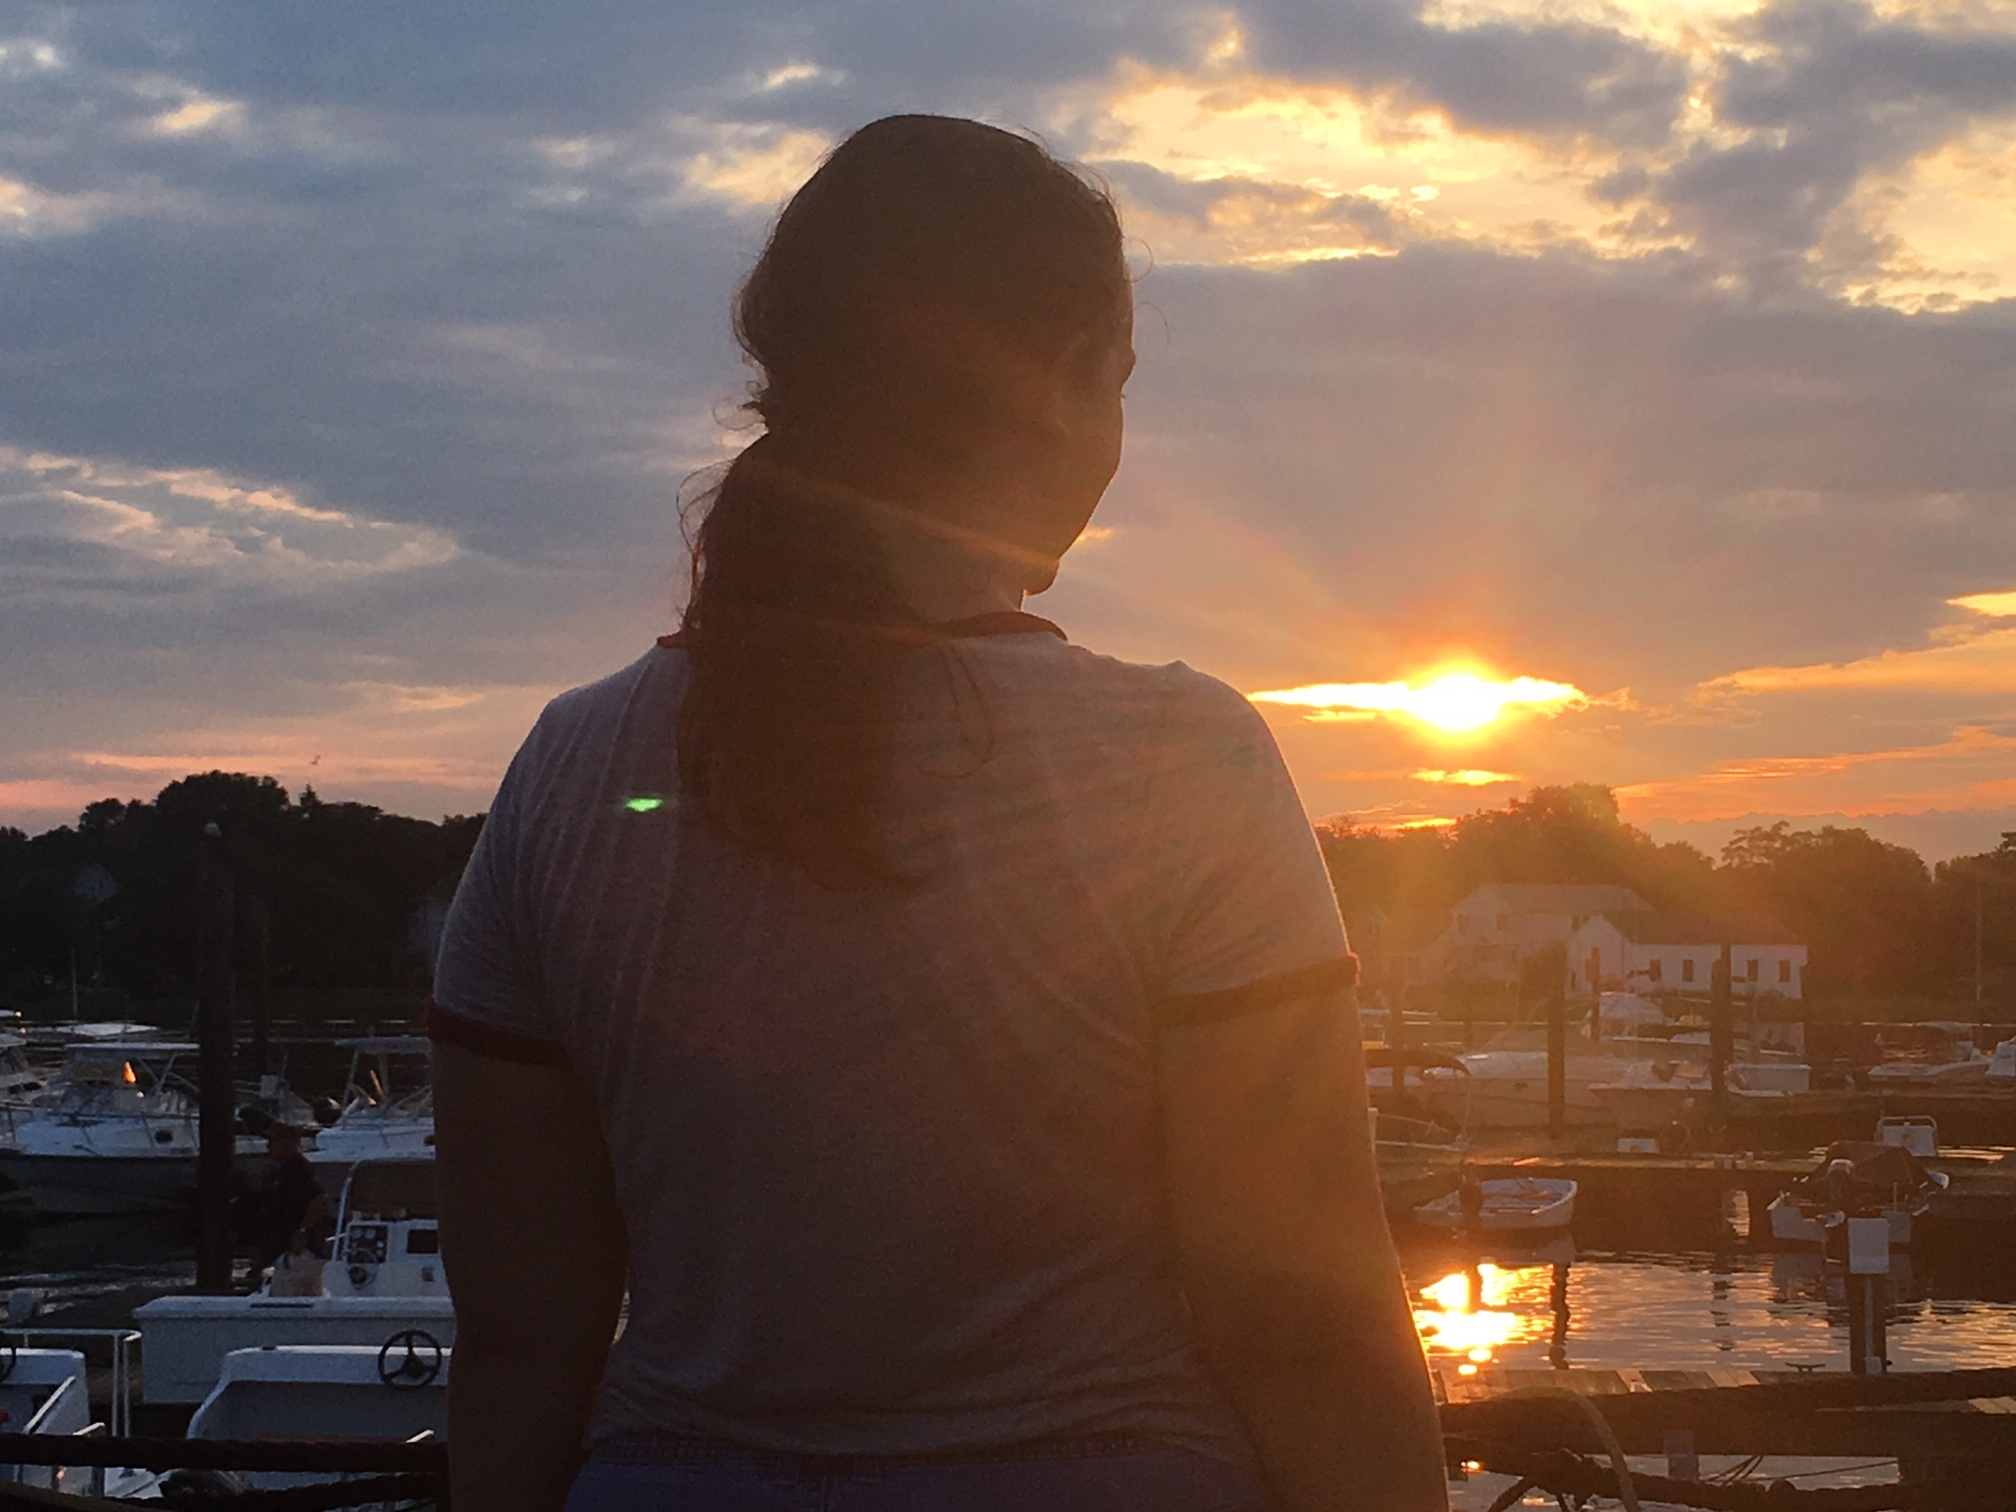 Kendra at Captain's Cove marina, Bridgeport